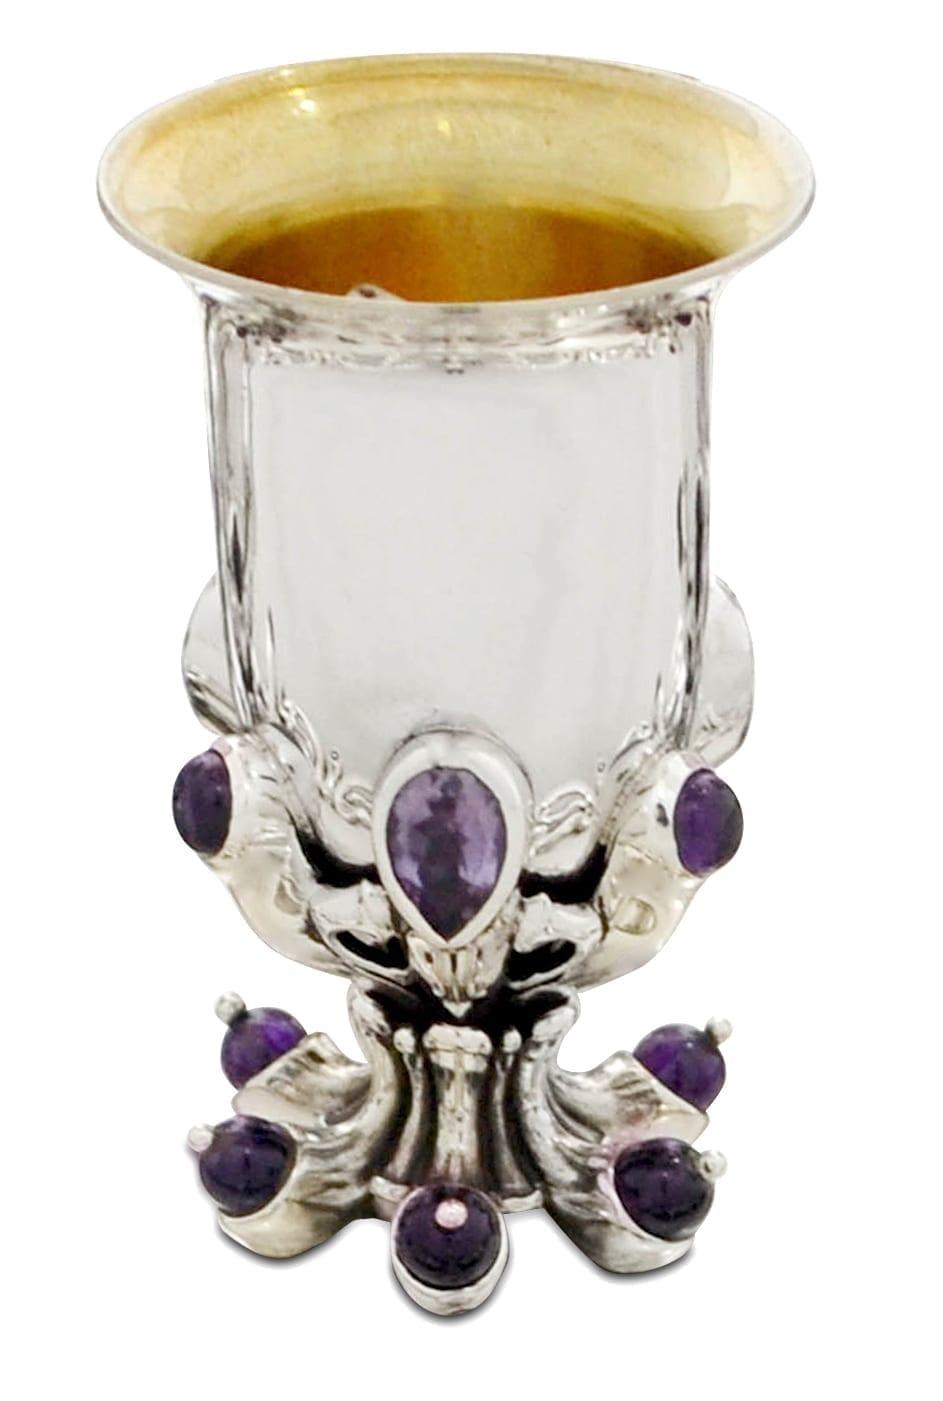 sterling silver liquor cup, semi-precious amethyst stones, judaica made in israel